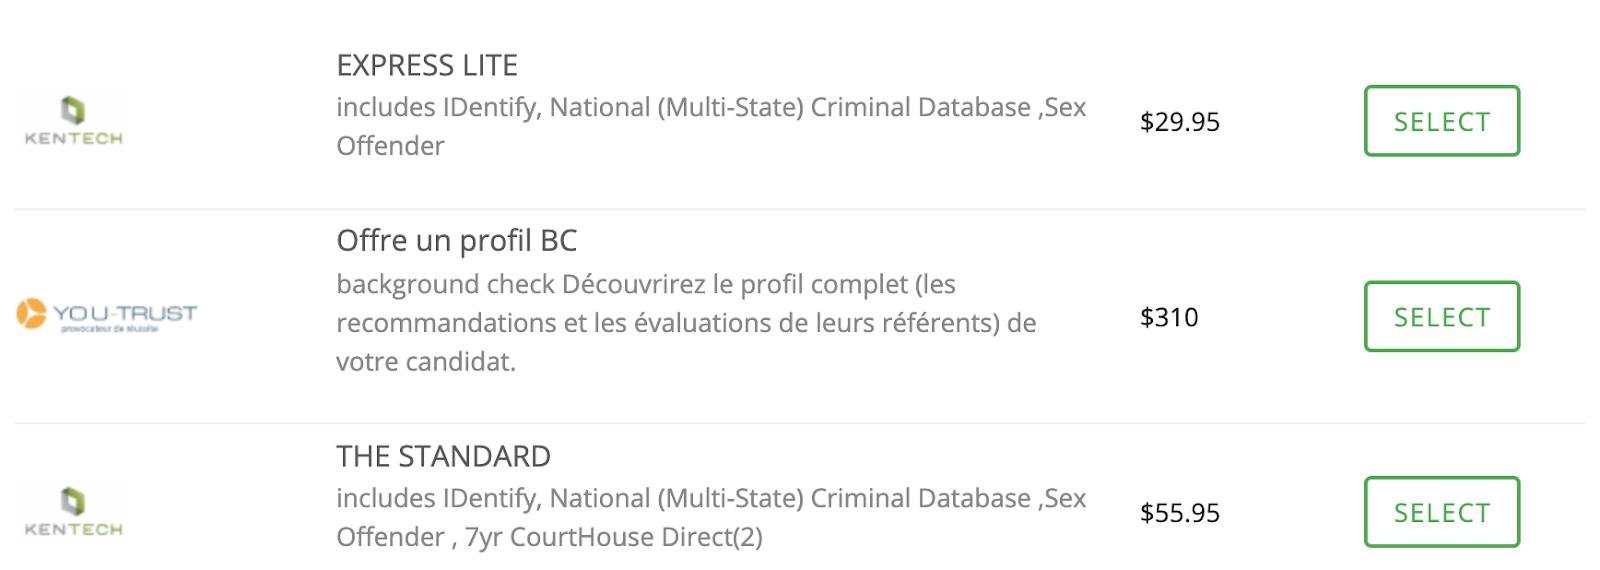 Macintosh HD:Users:katarzynaradzyminska:Desktop:Screenshot 2019-12-31 at 14.40.12.png